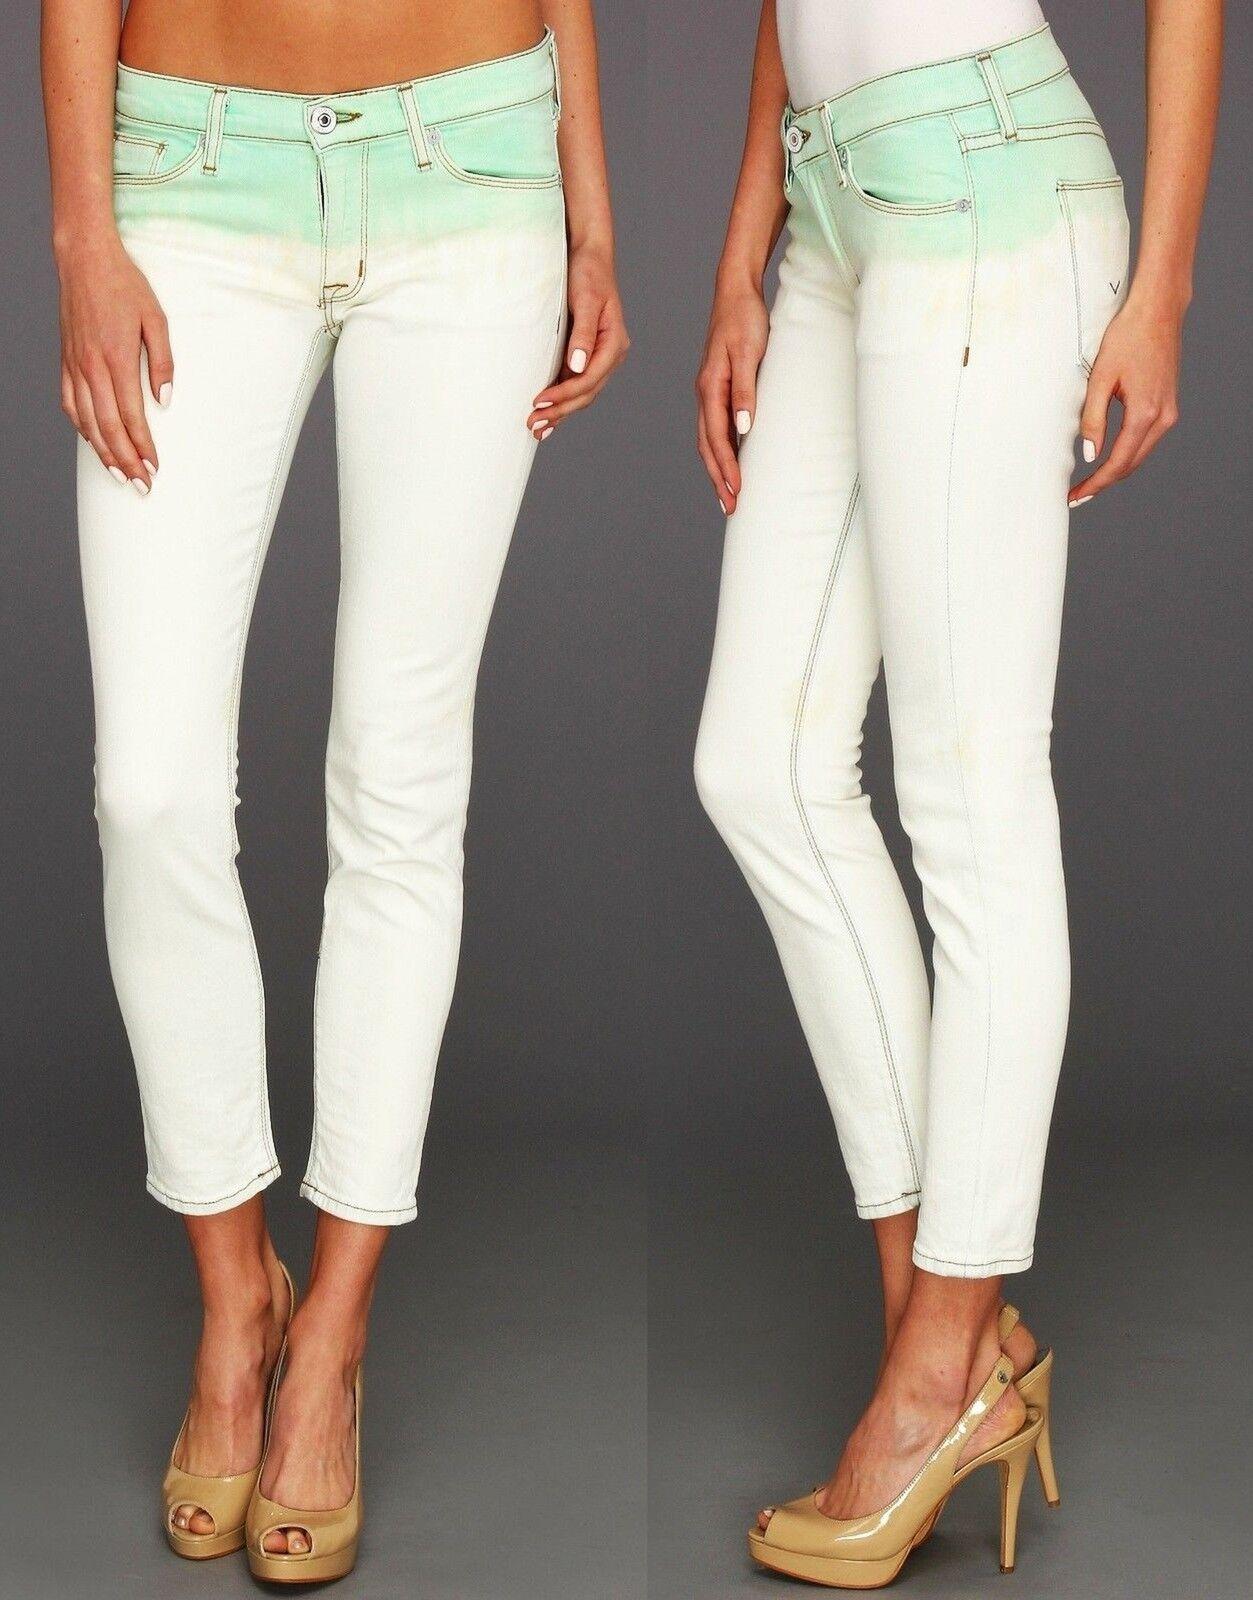 NEW Hudson sz 27 Jeans Krista Super Skinny Crop Pale Jade Pants Women Girl